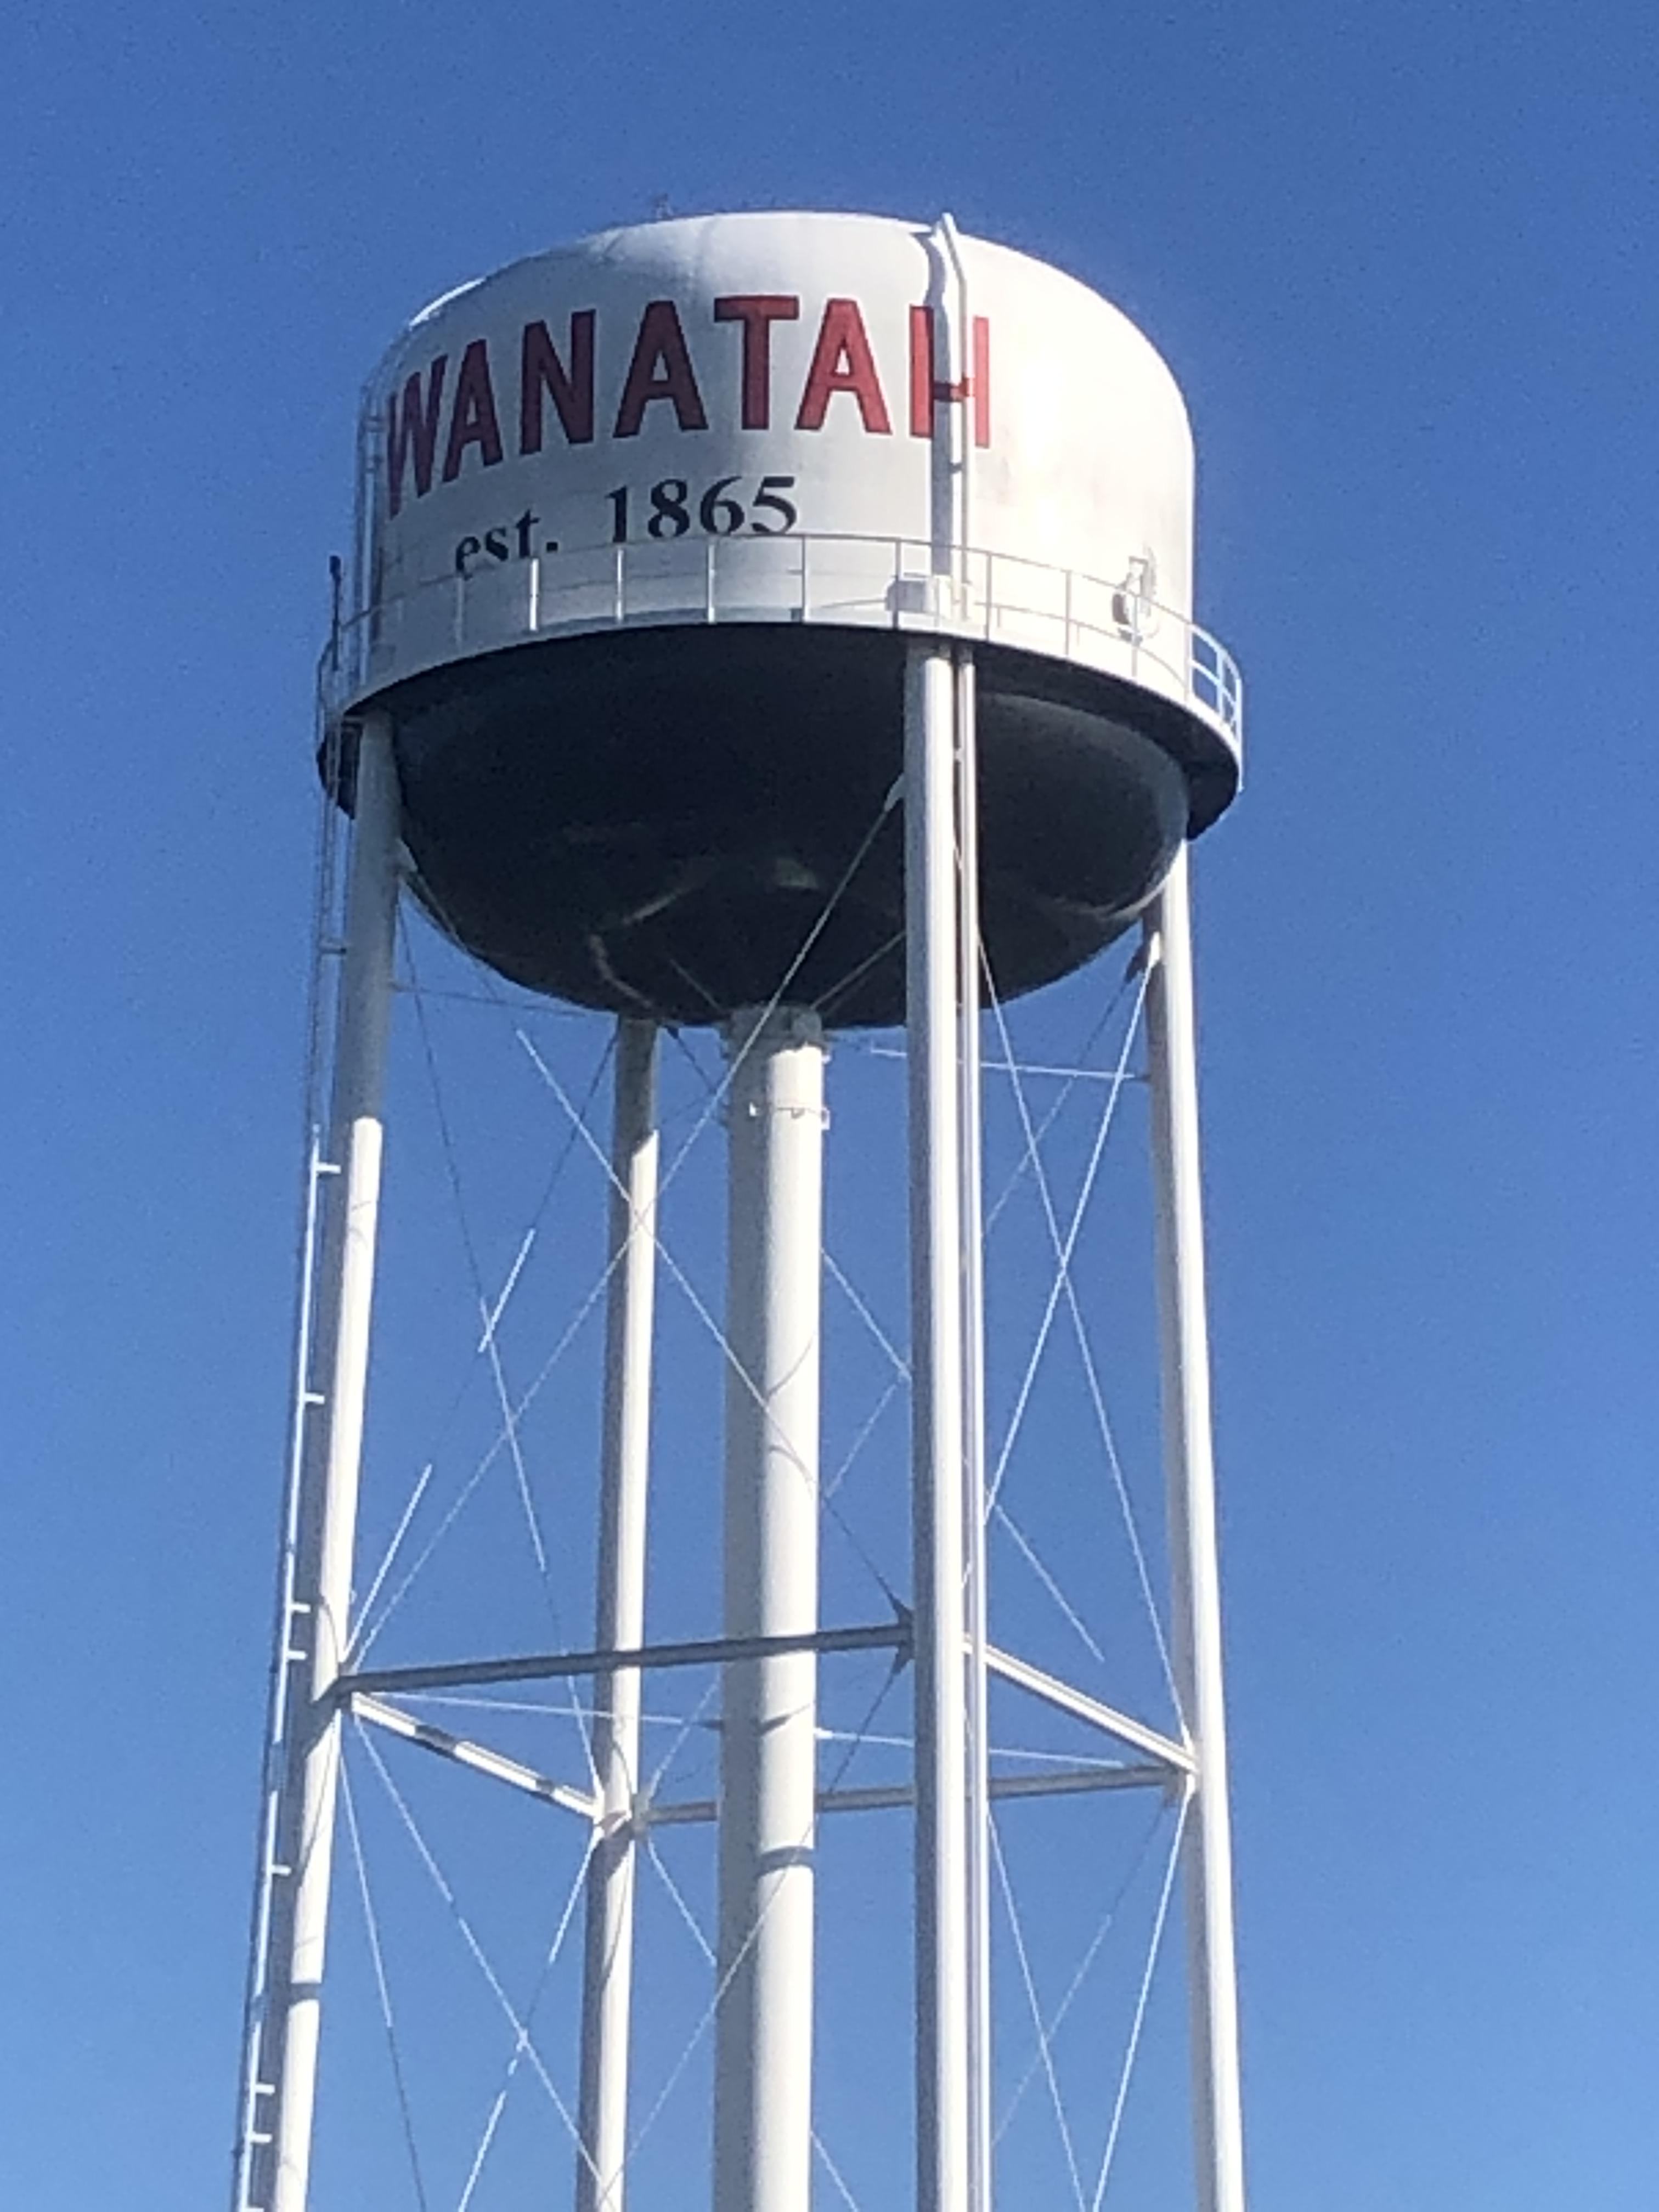 wanatah goodby 4